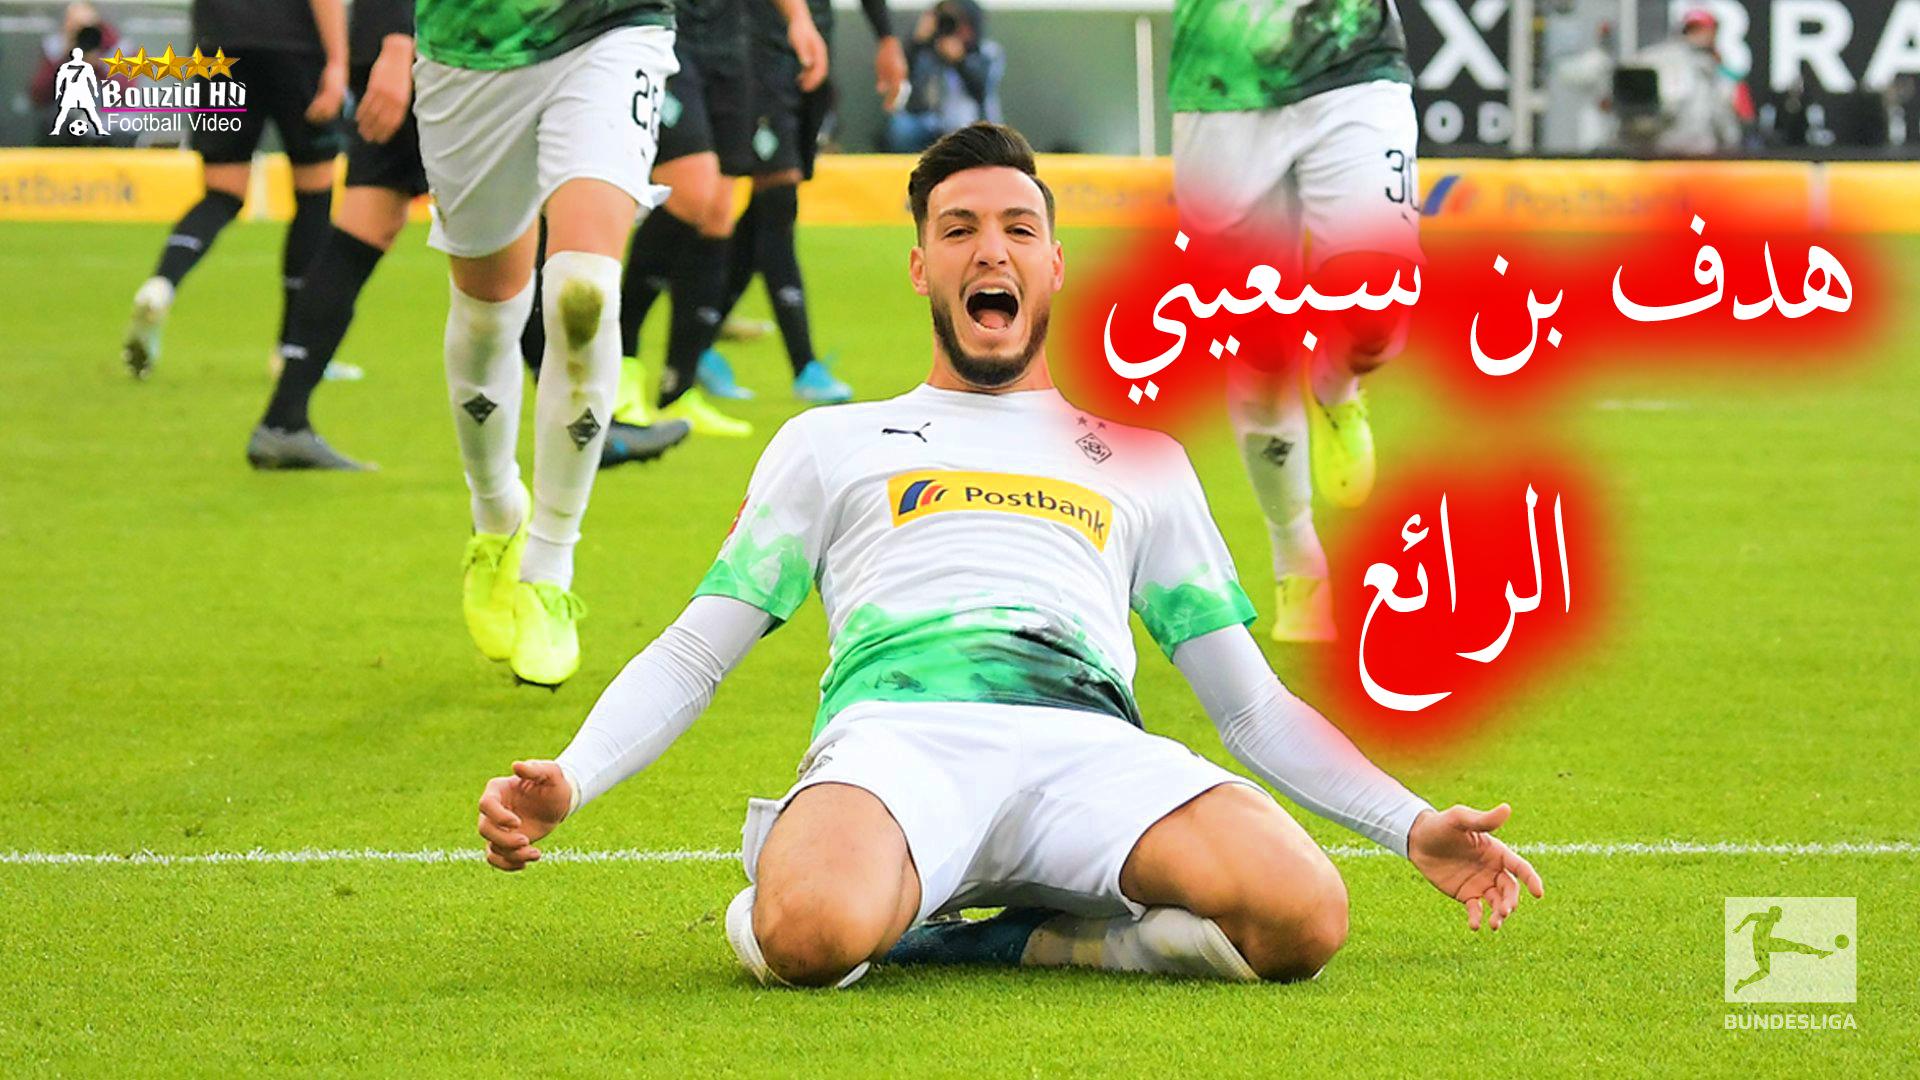 شاهد هدف رامي بن سبعيني امام فردربريمن 28